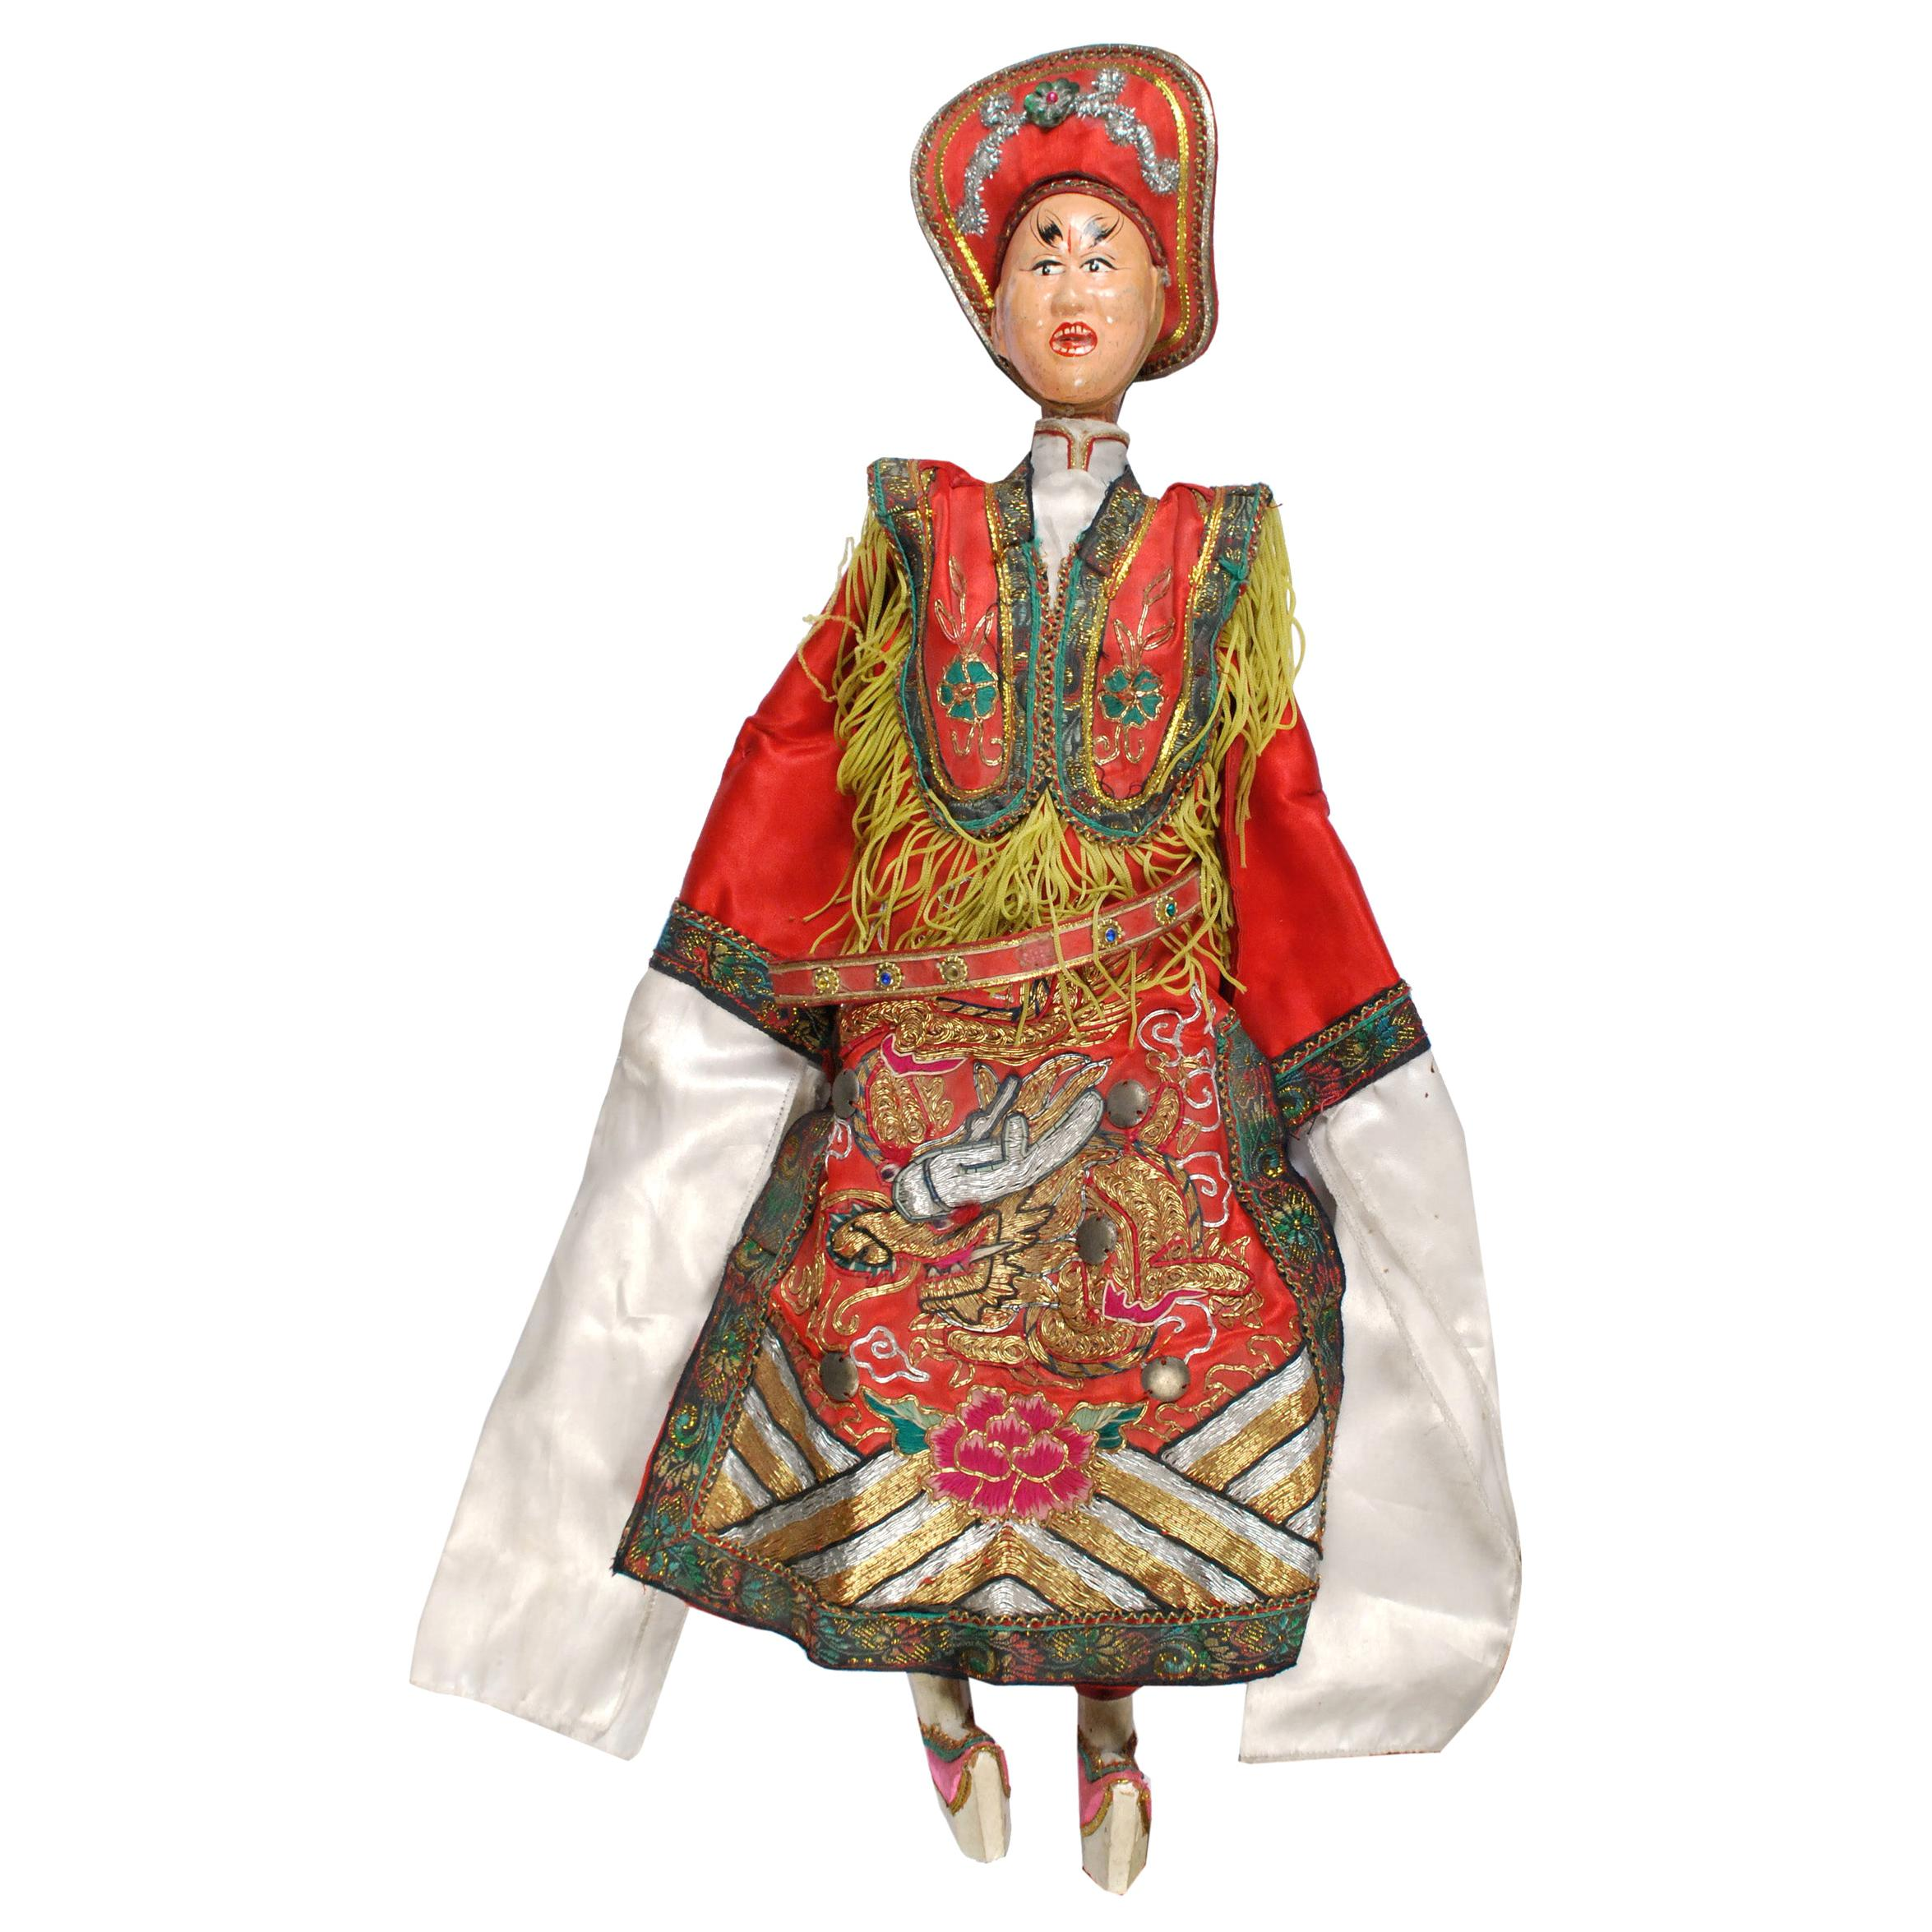 Early 20th Century Chinese Opera Puppet